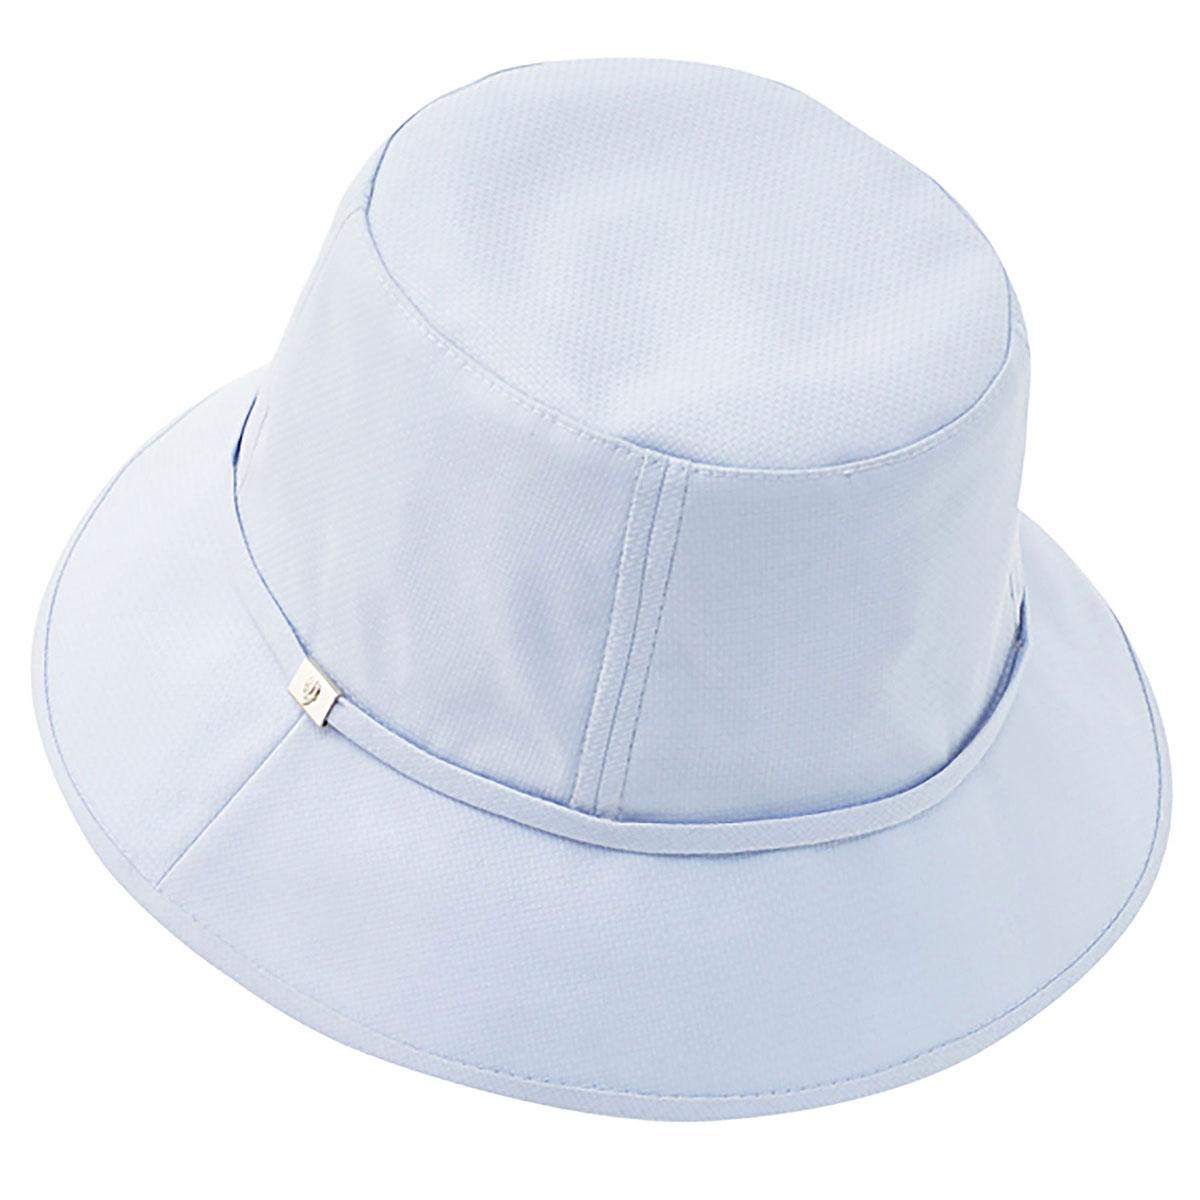 Women's Vintage Hats | Old Fashioned Hats | Retro Hats Yamina Bucket Hat $85.00 AT vintagedancer.com